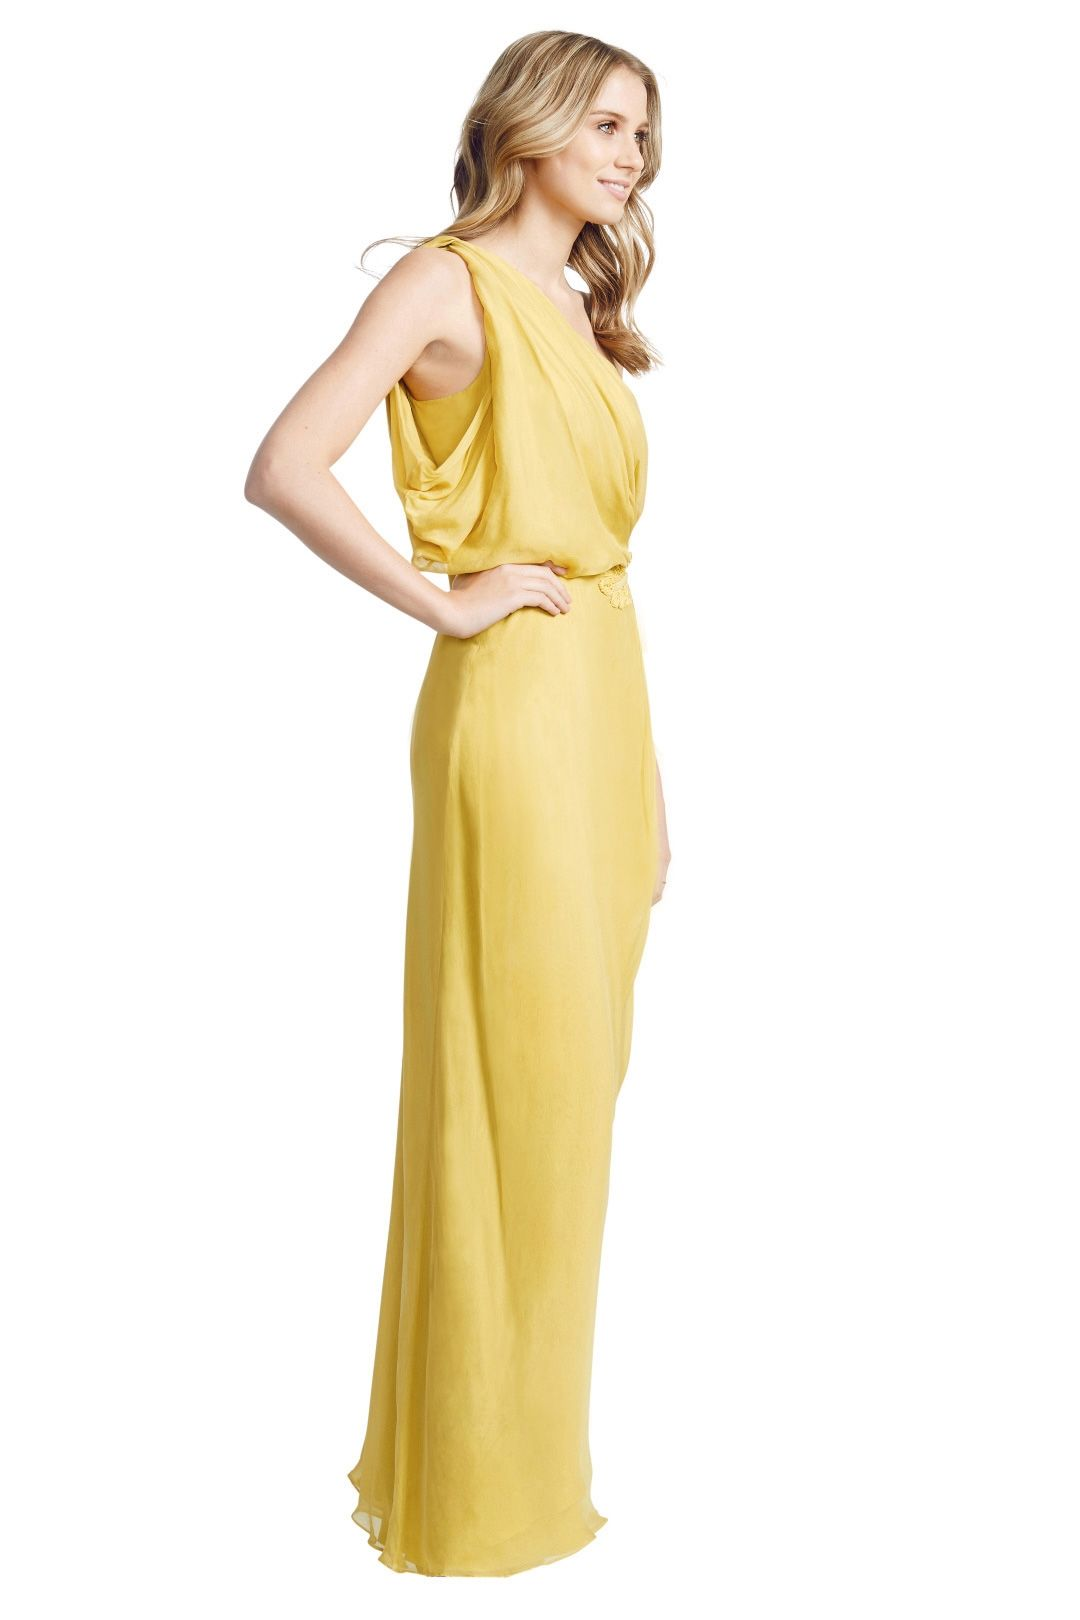 Aurelio Costarella - Athene Gown - Yellow - Side